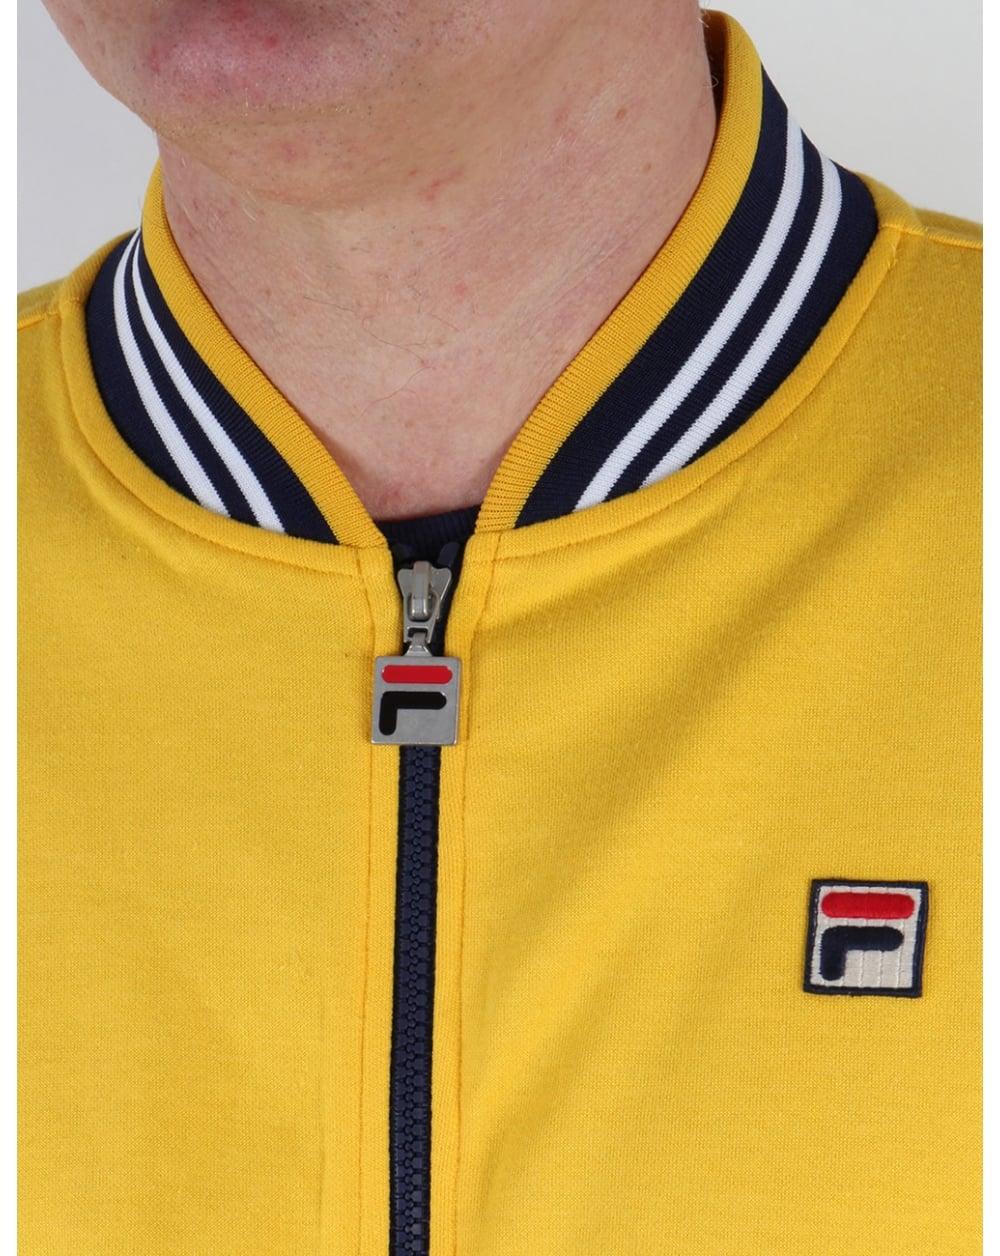 fila yellow top. fila vintage mk1 settanta track top golden yellow